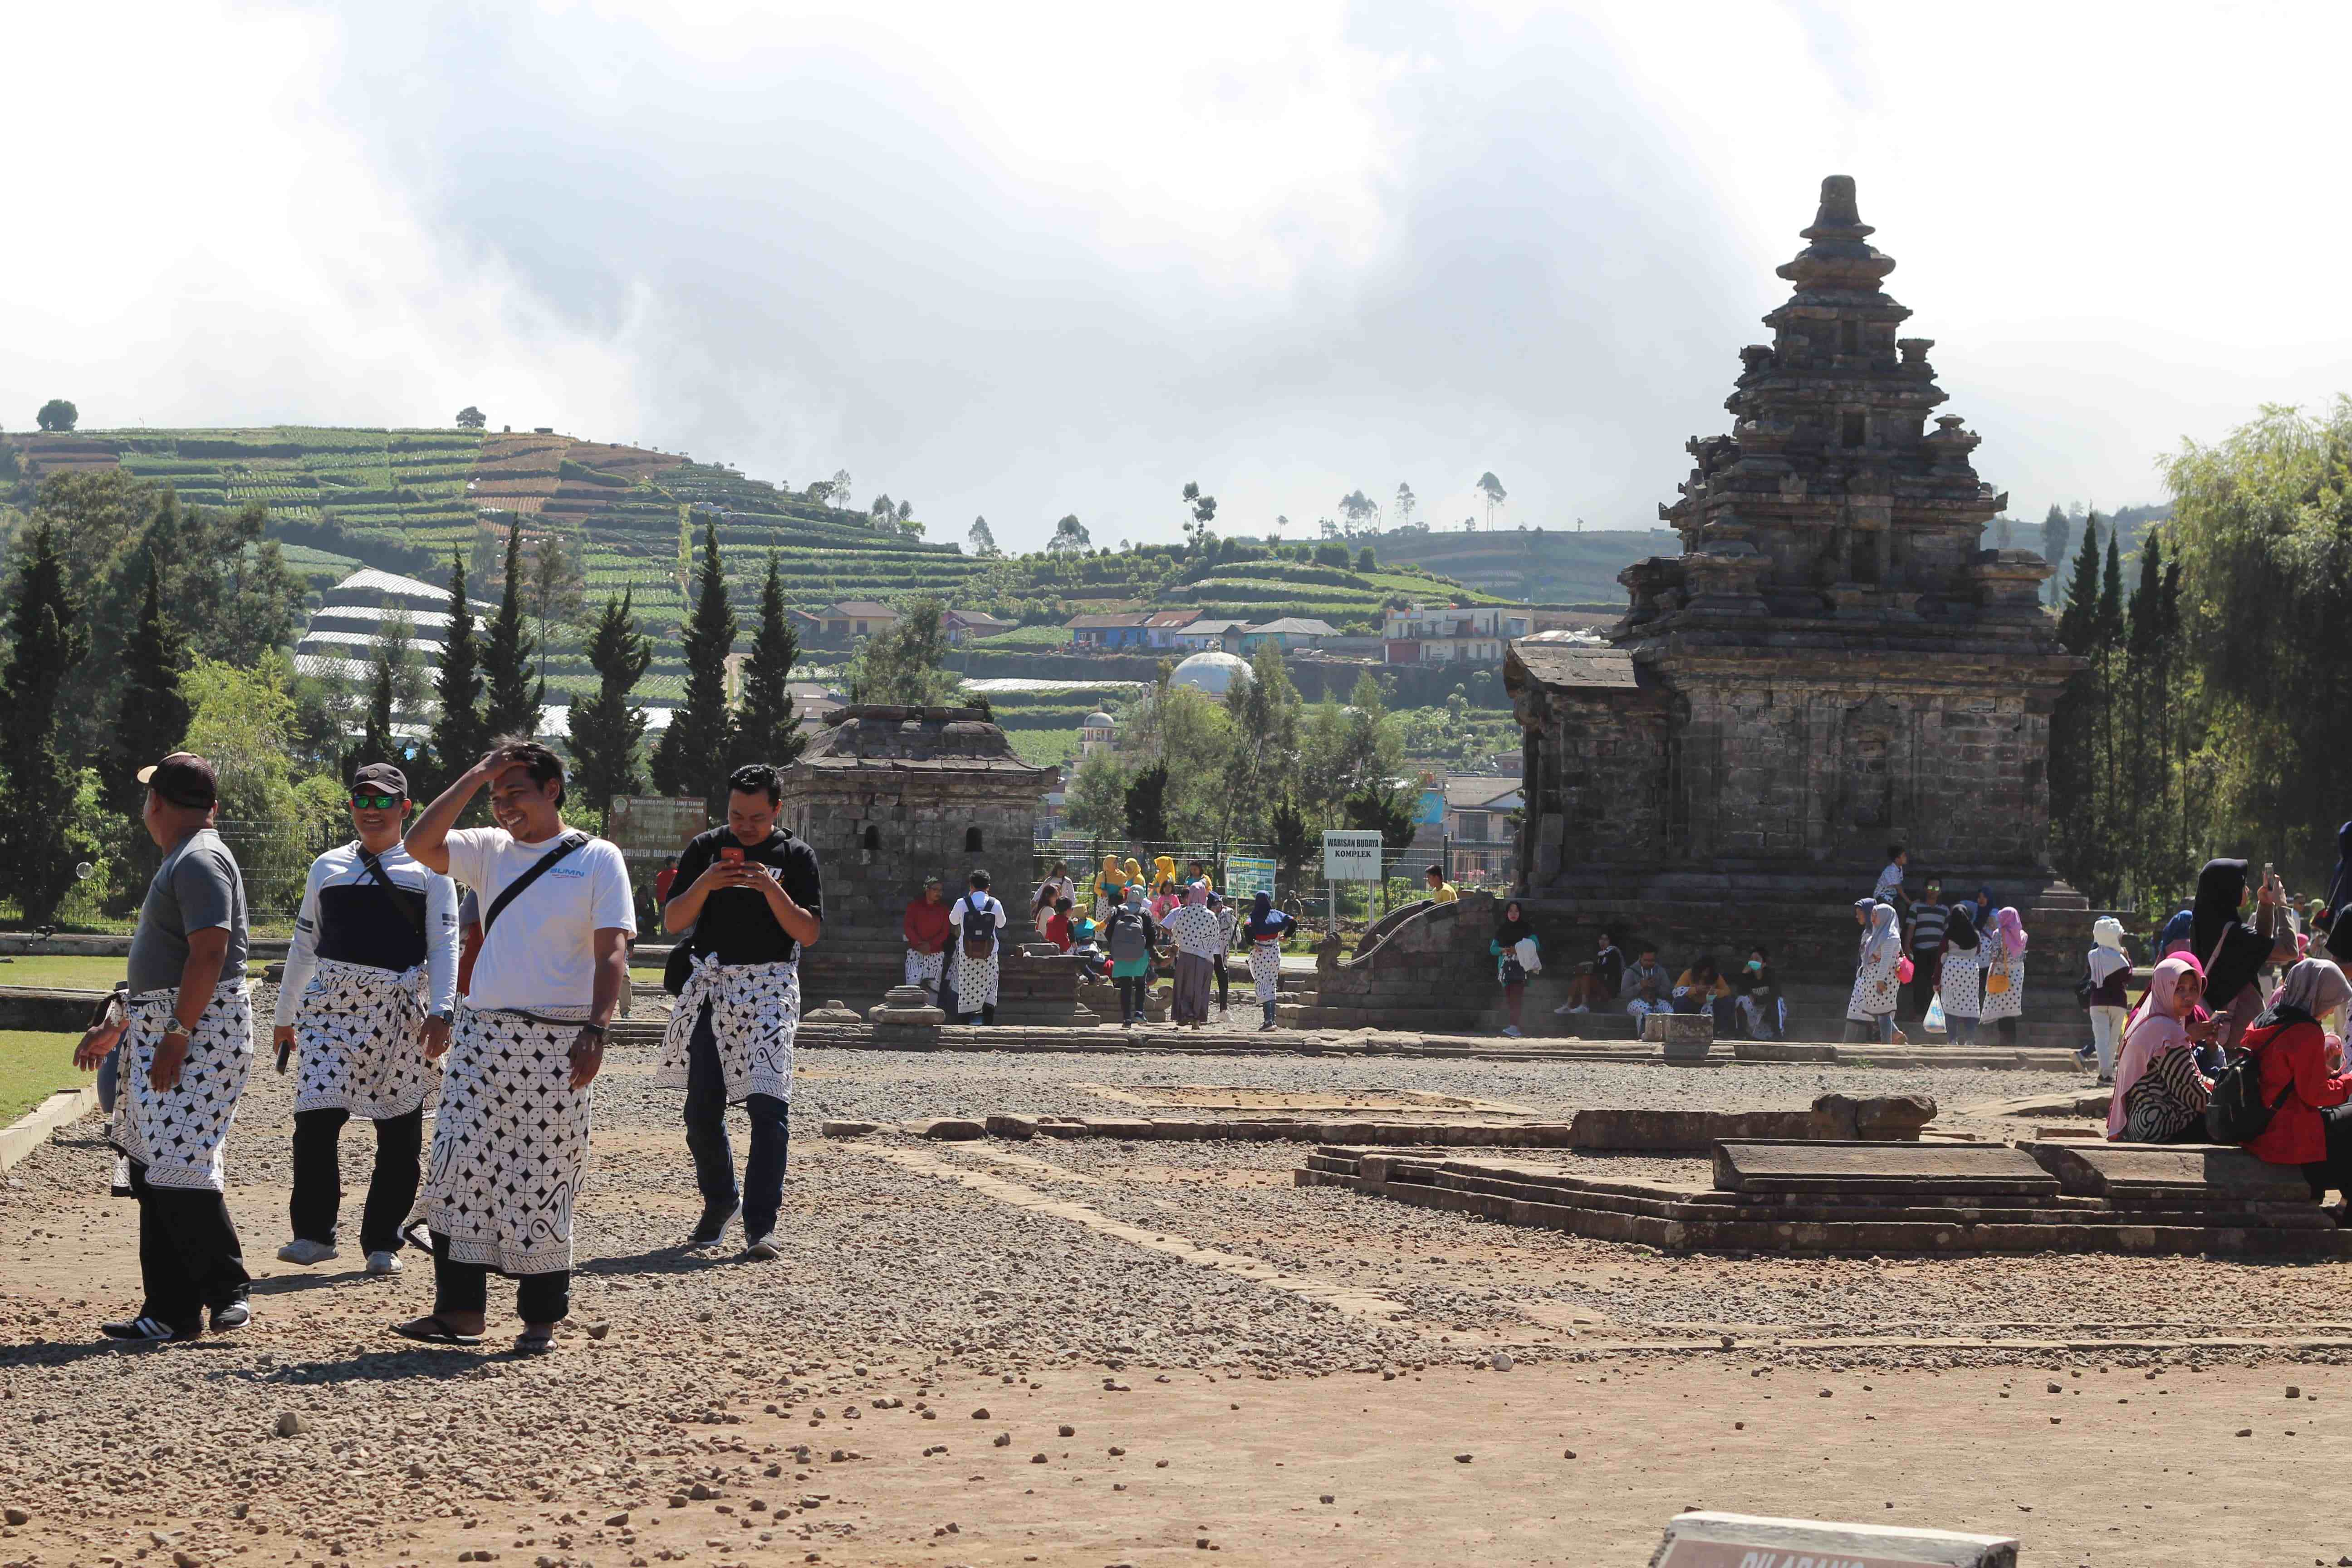 Kawasan wisata Candi Arjuna Dieng merupakan peninggalan kerajaan Hindu Budha tempo dulu